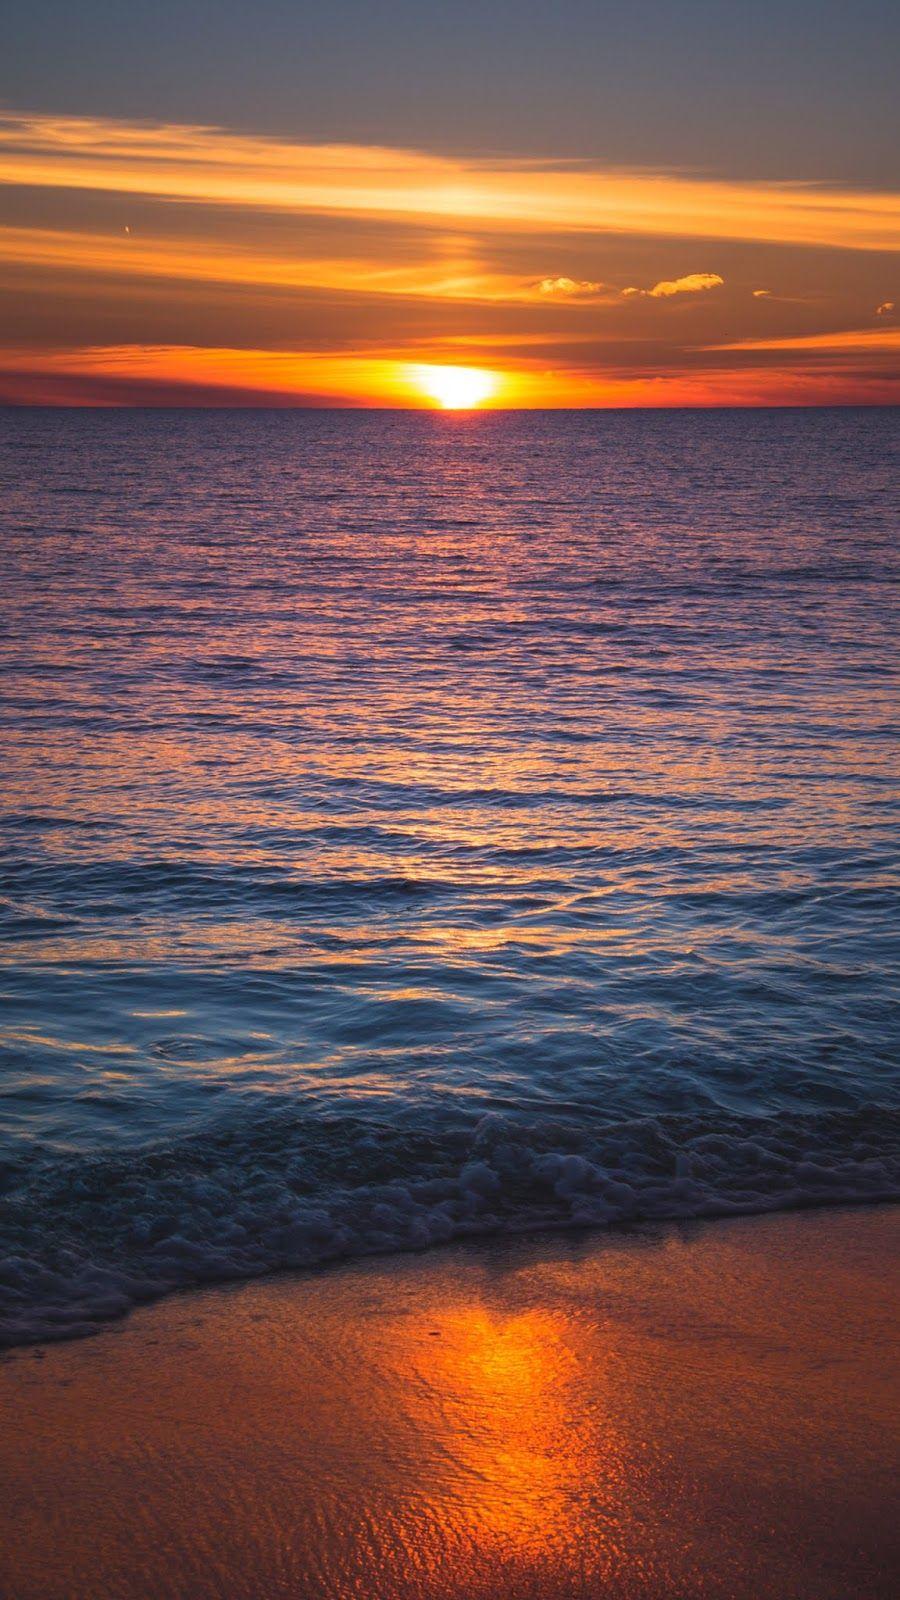 Sunset In The Beach Beach Wallpaper Beautiful Nature Sunset